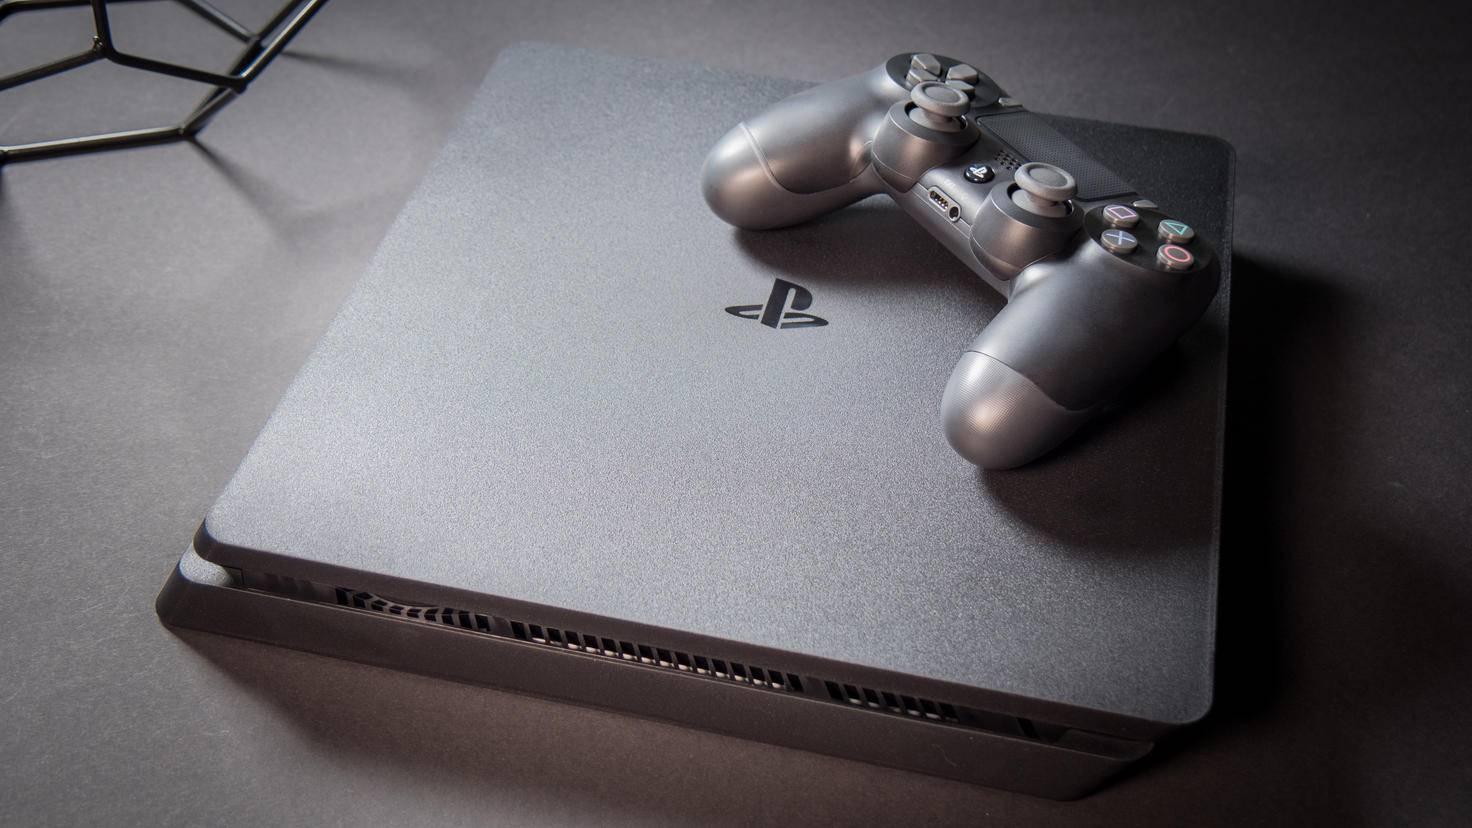 PlayStation 4 Slim PS4 Slim